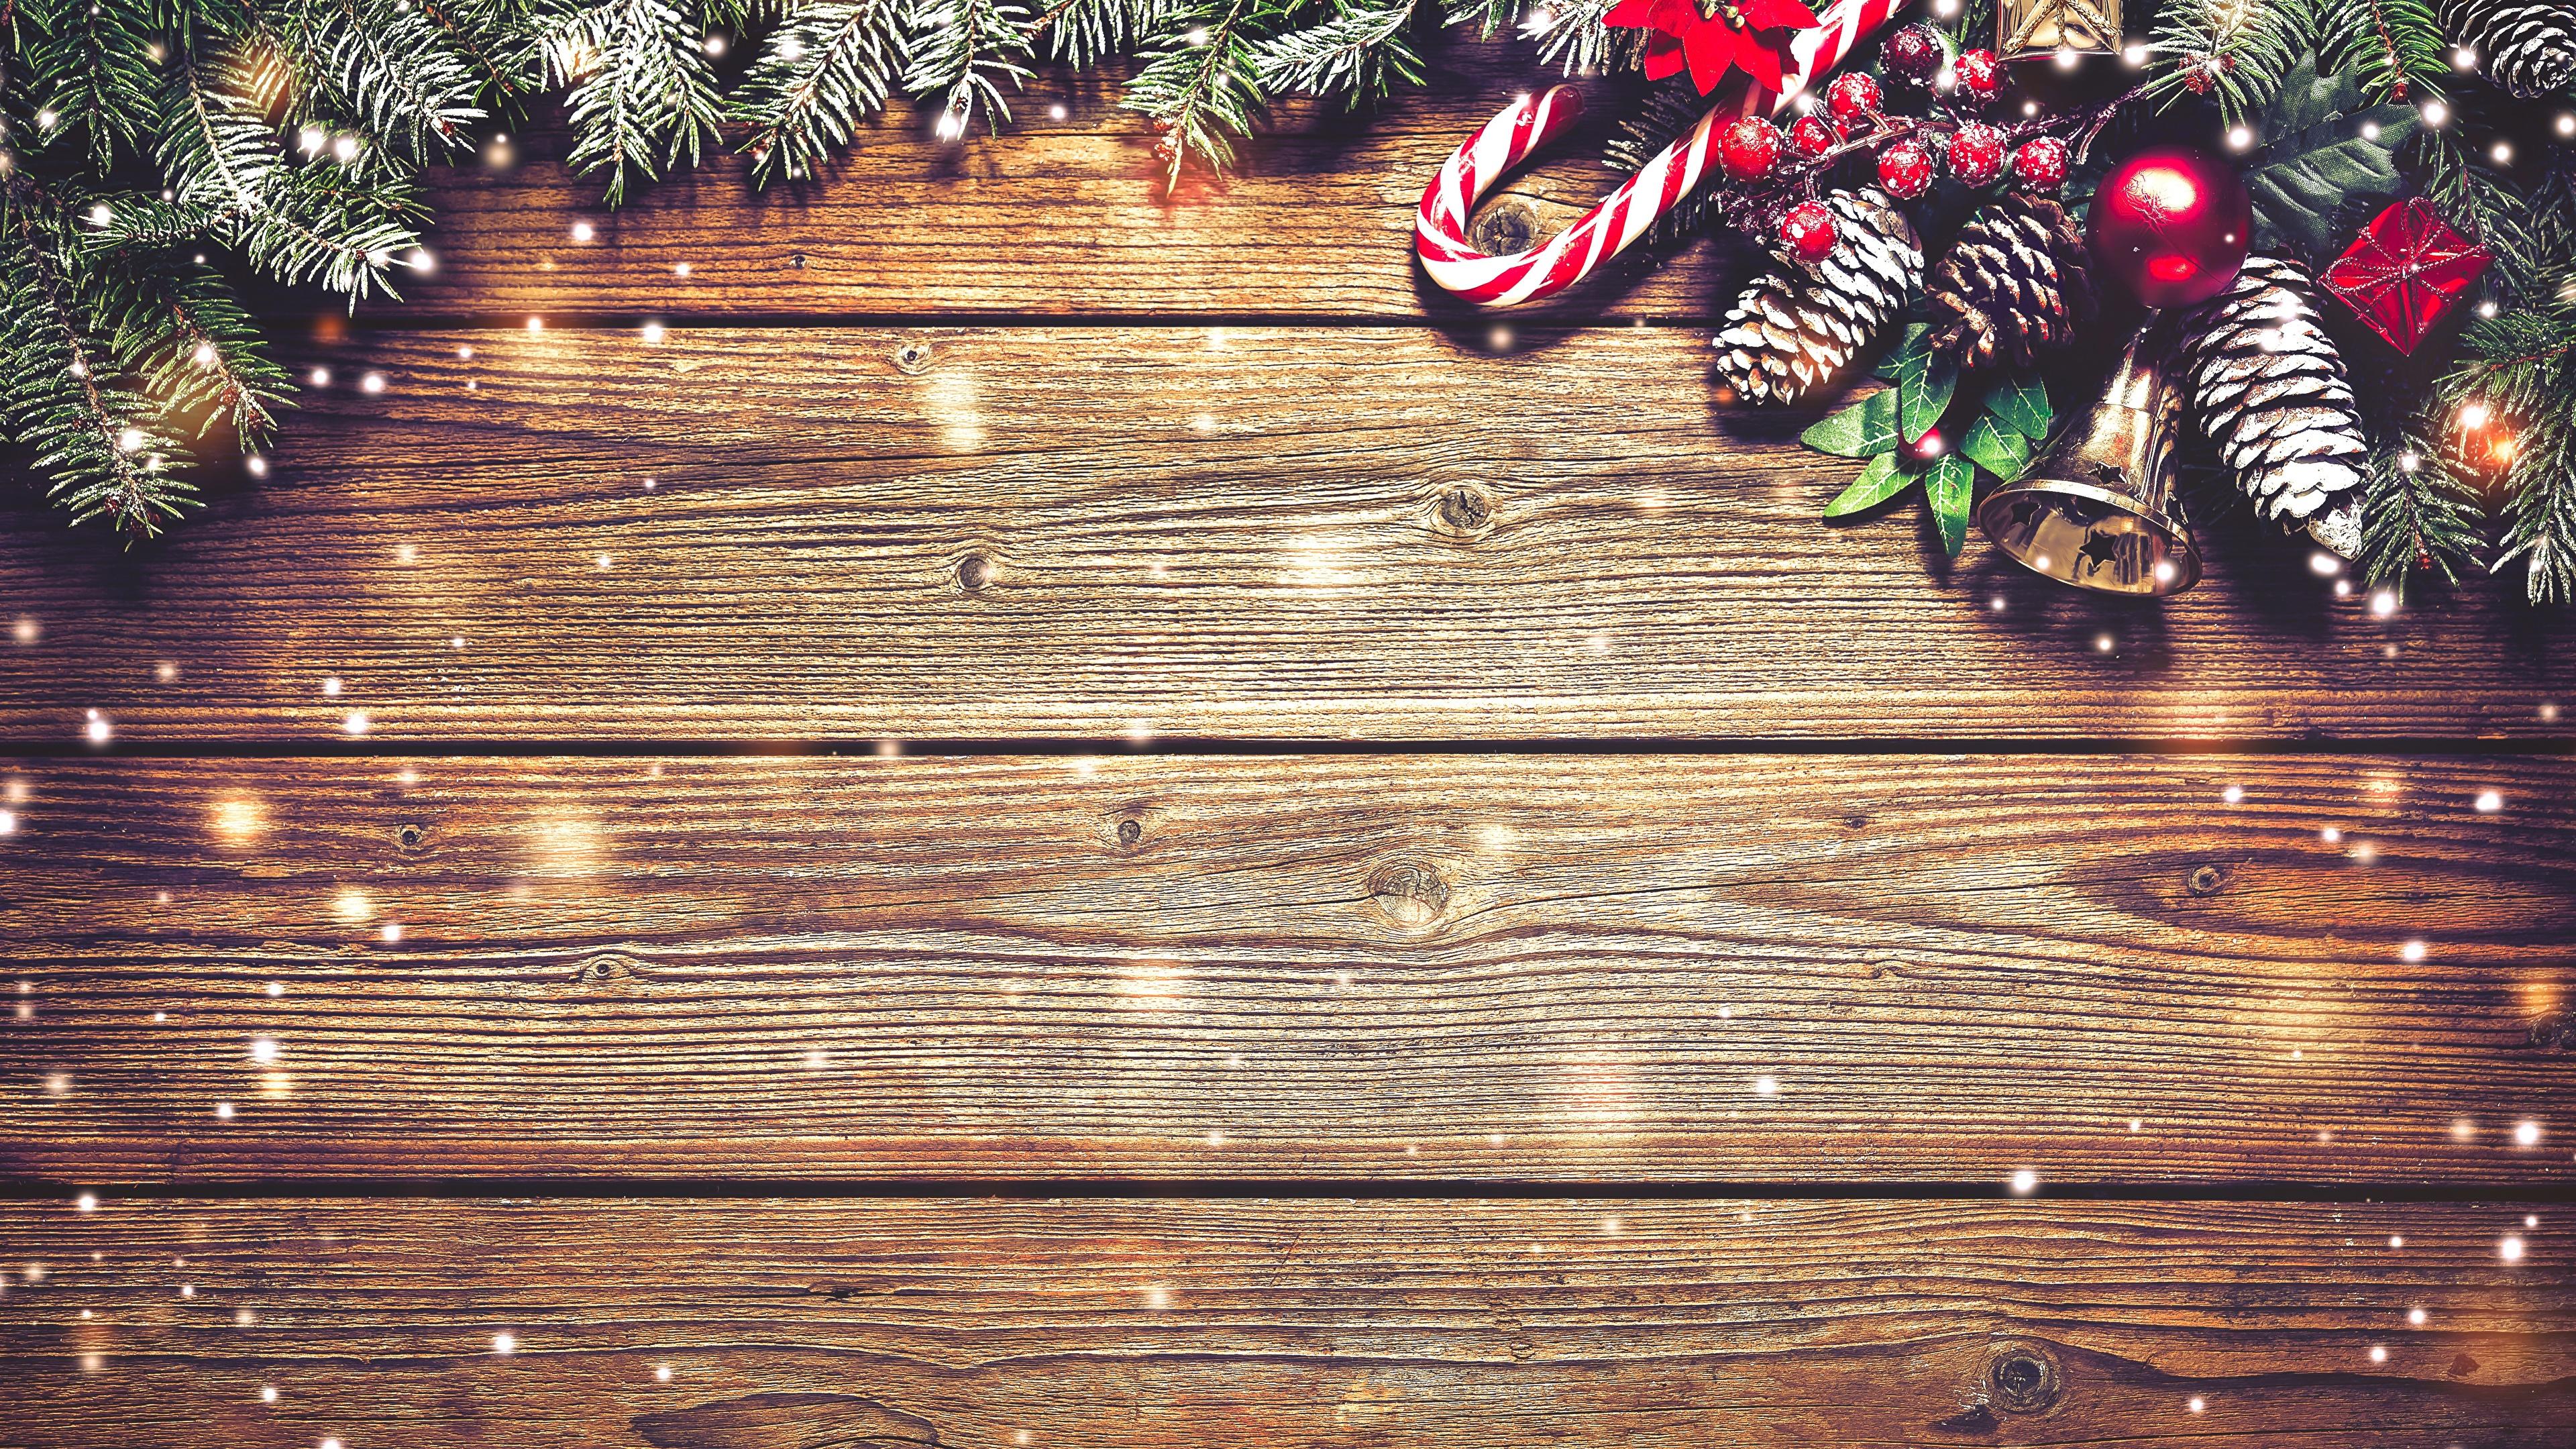 christmas holiday desktop wallpaper